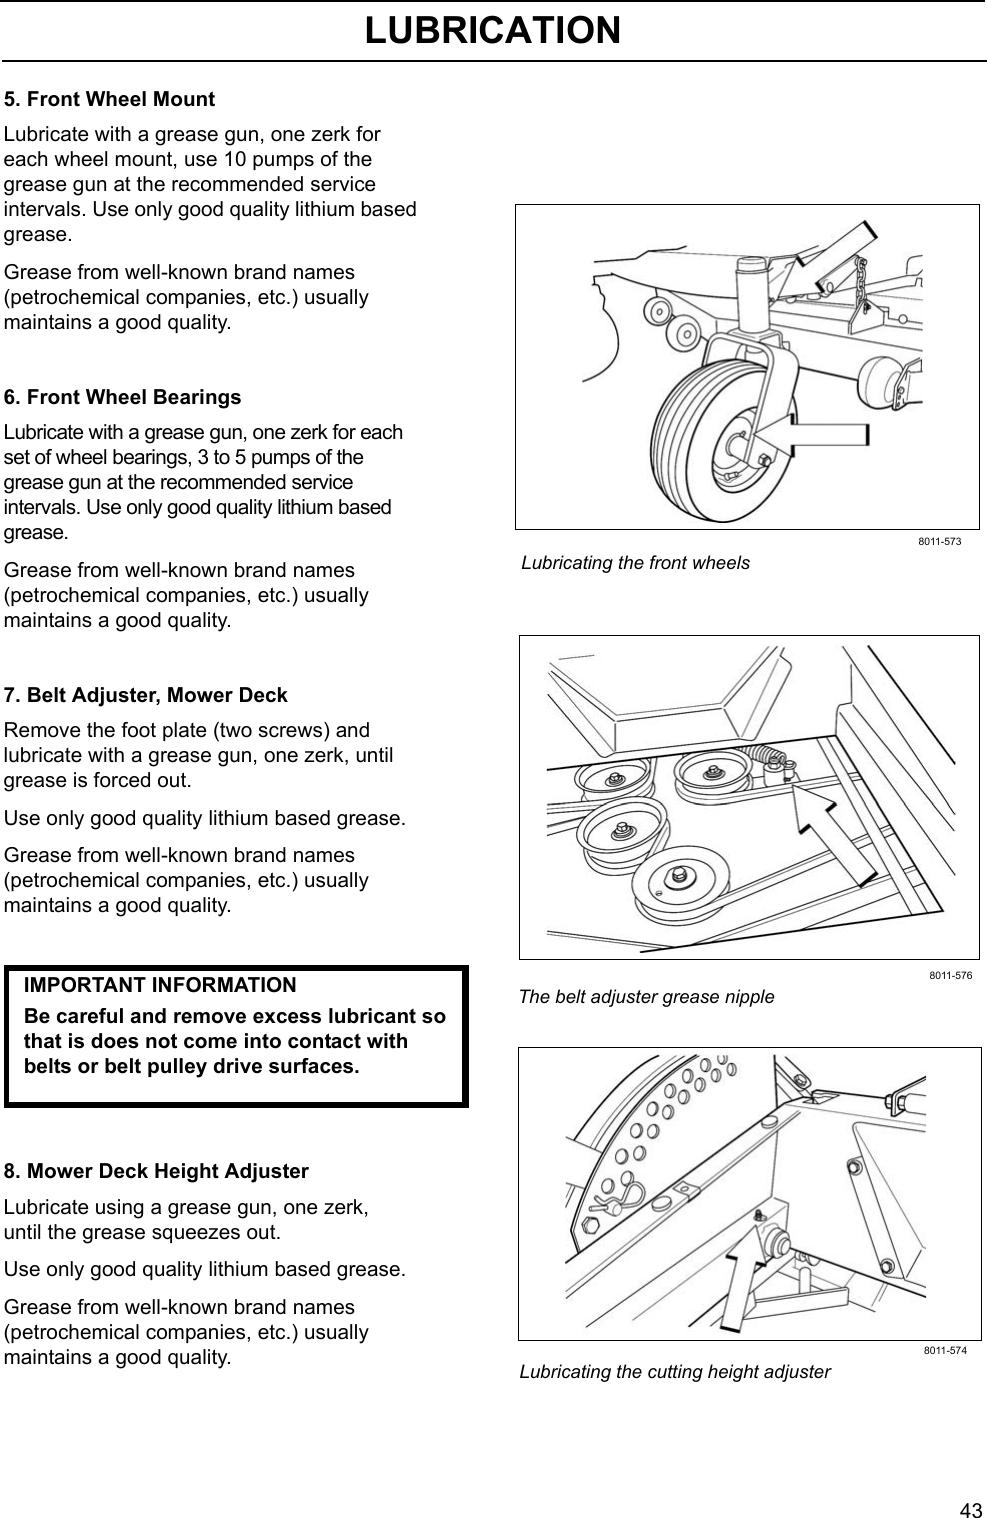 Yazoo Kees Zhdd61270 Zhdd61340 Zhdd72340 Users Manual OM